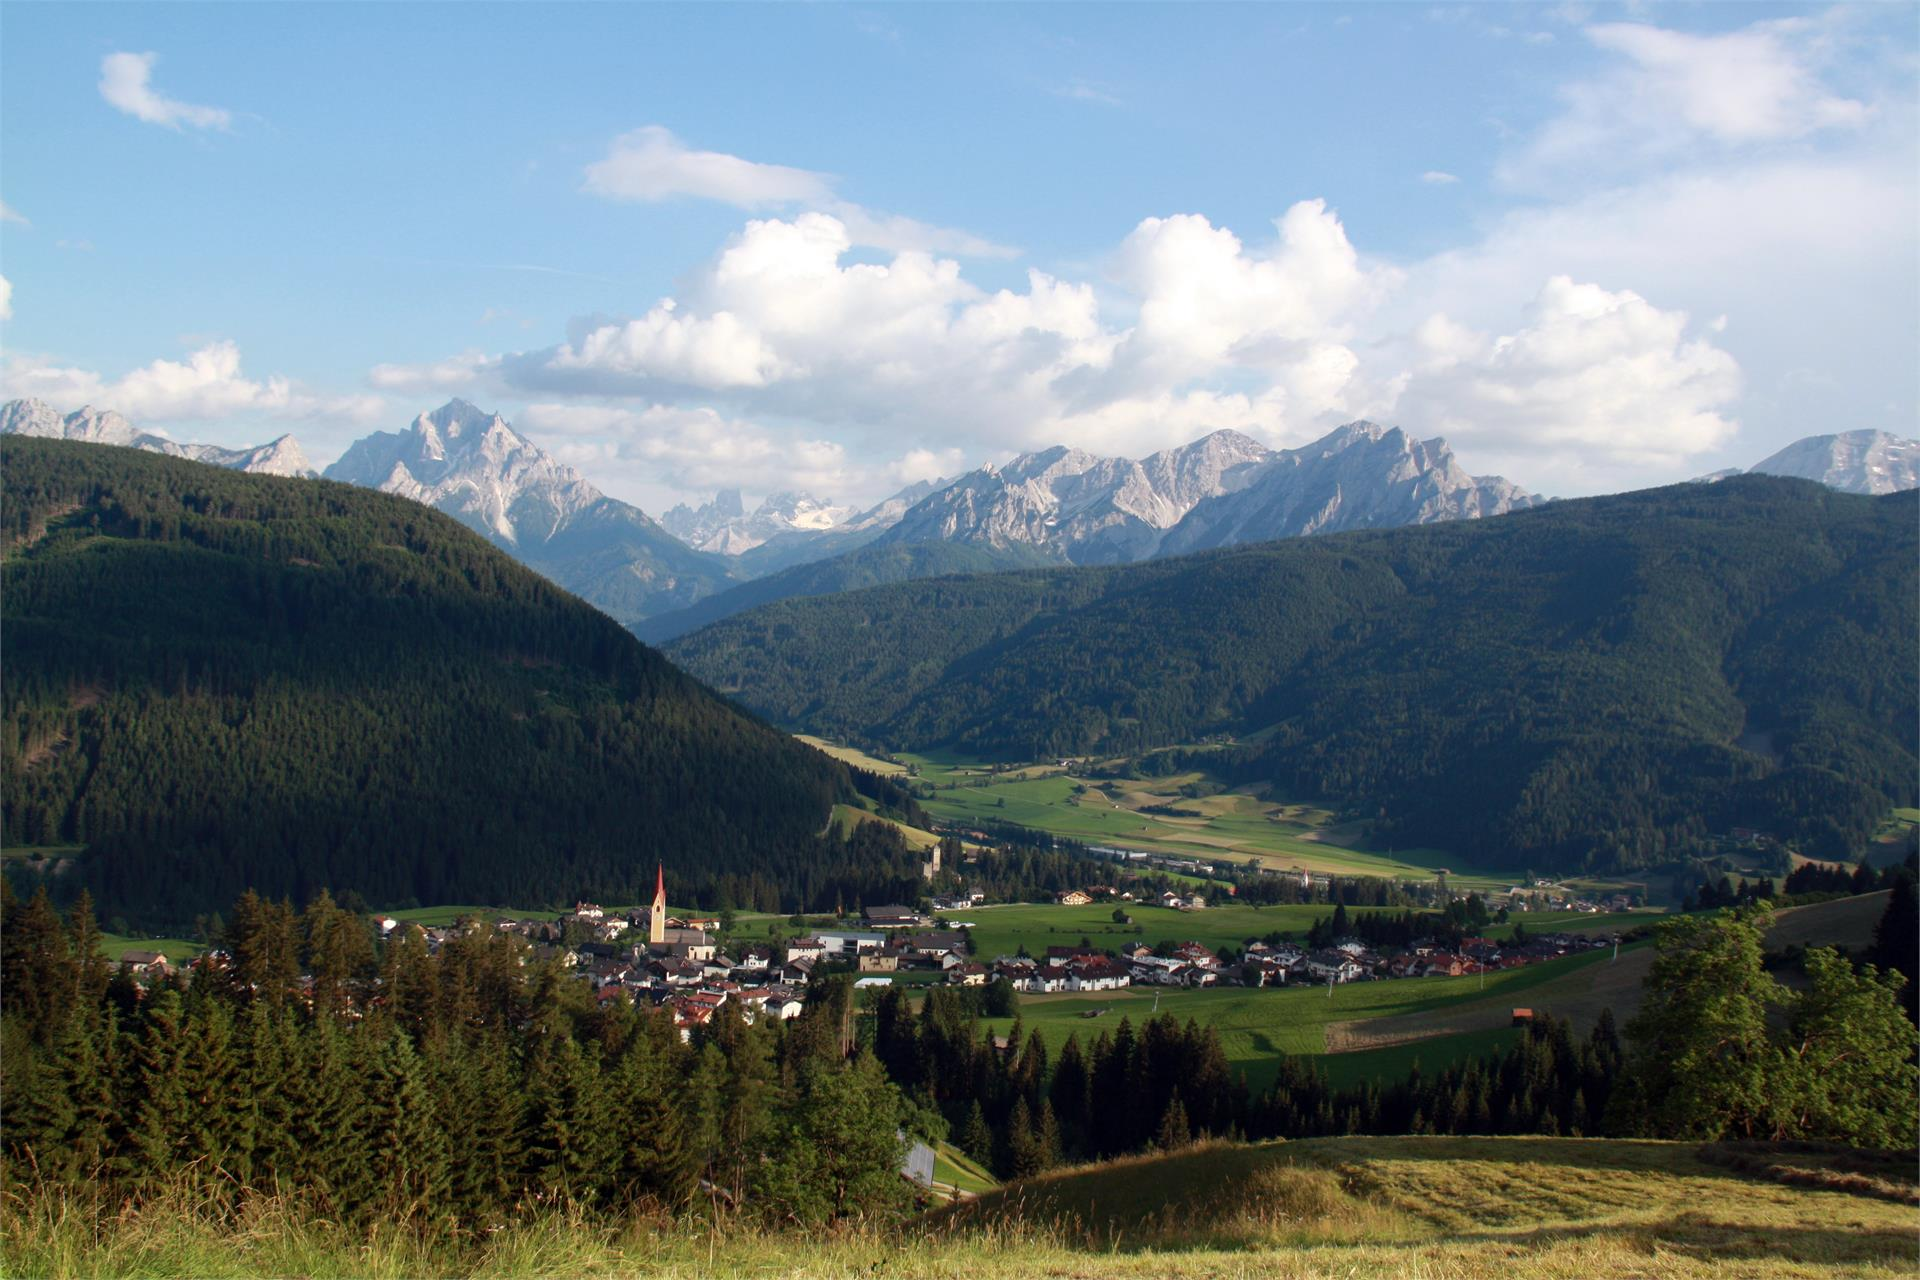 Escursione al ristorante di montagna Mudlerhof a Tesido